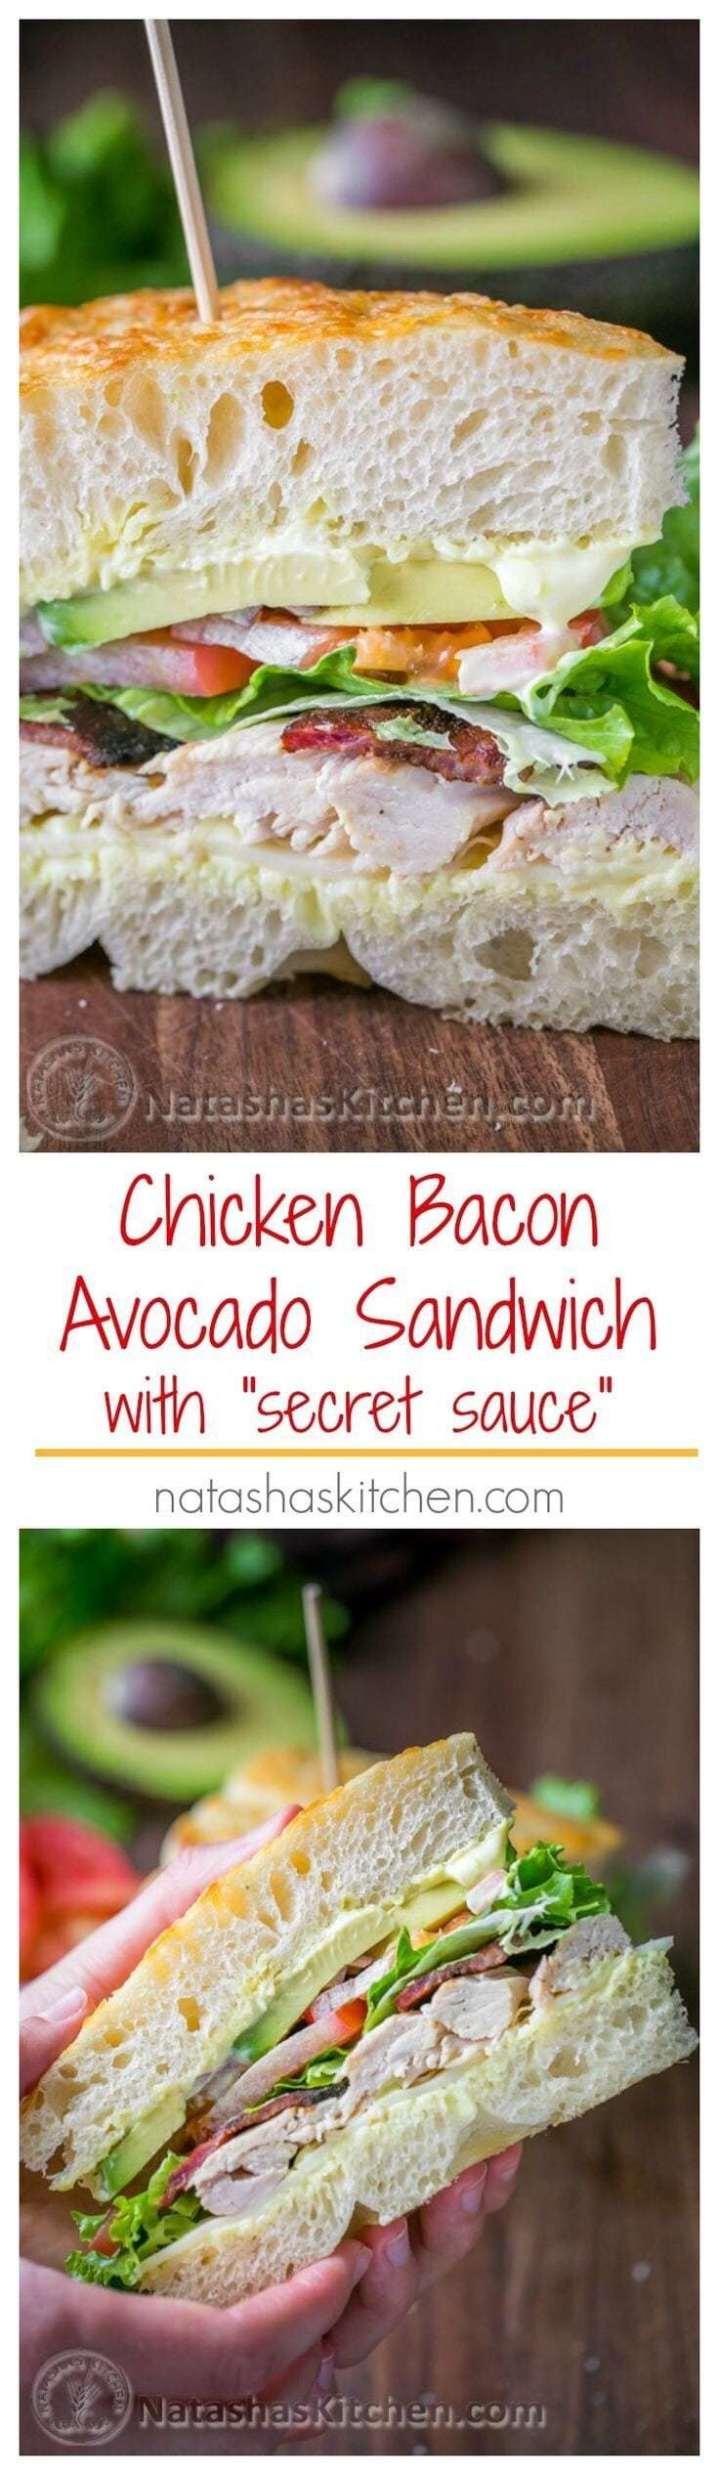 "Chicken Bacon Avocado Sandwich with ""Secret Sauce"" - - 20 Best Croissant Sandwich Recipes"